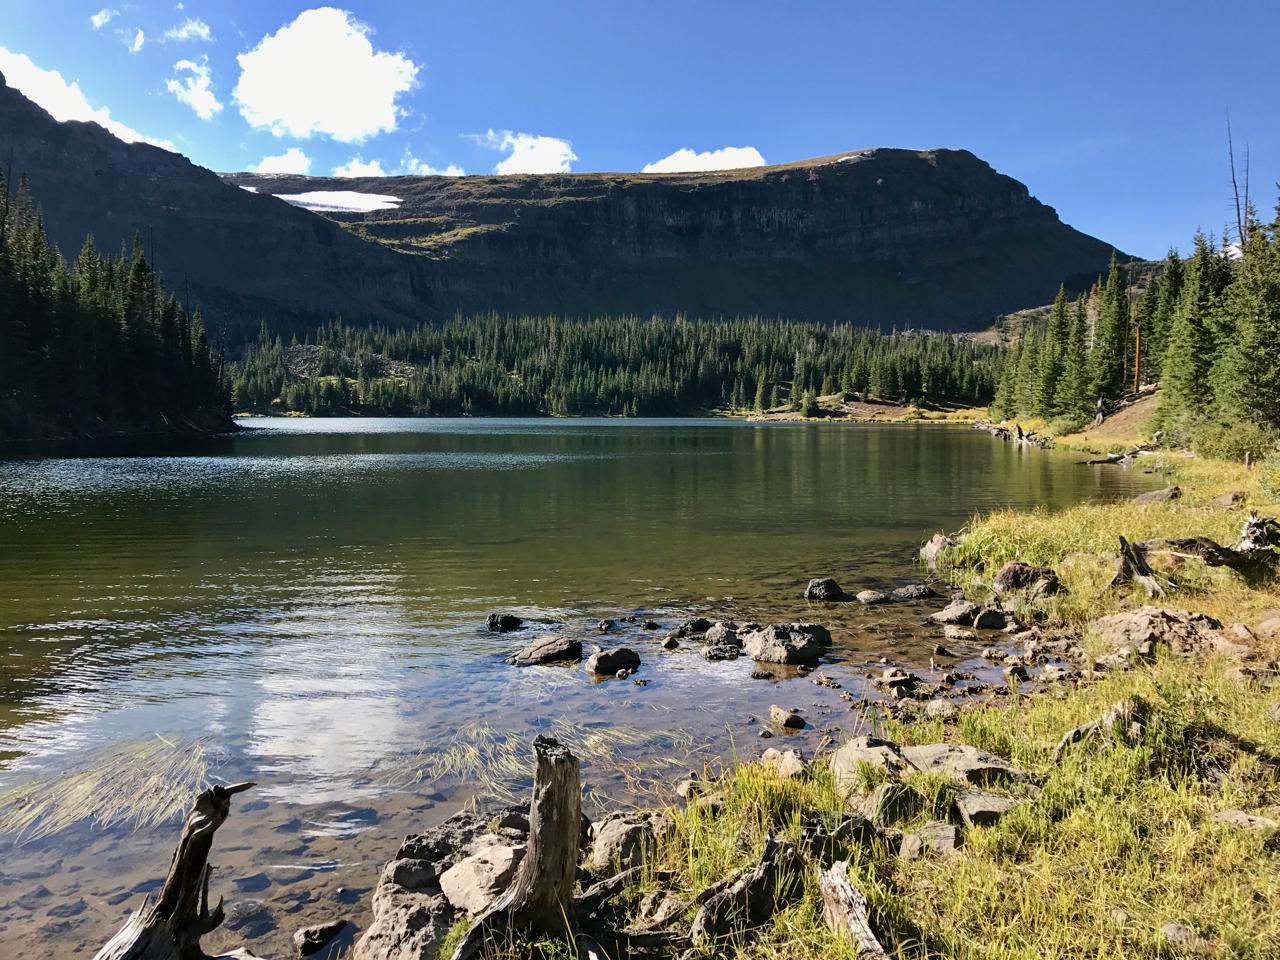 Hooper Lake